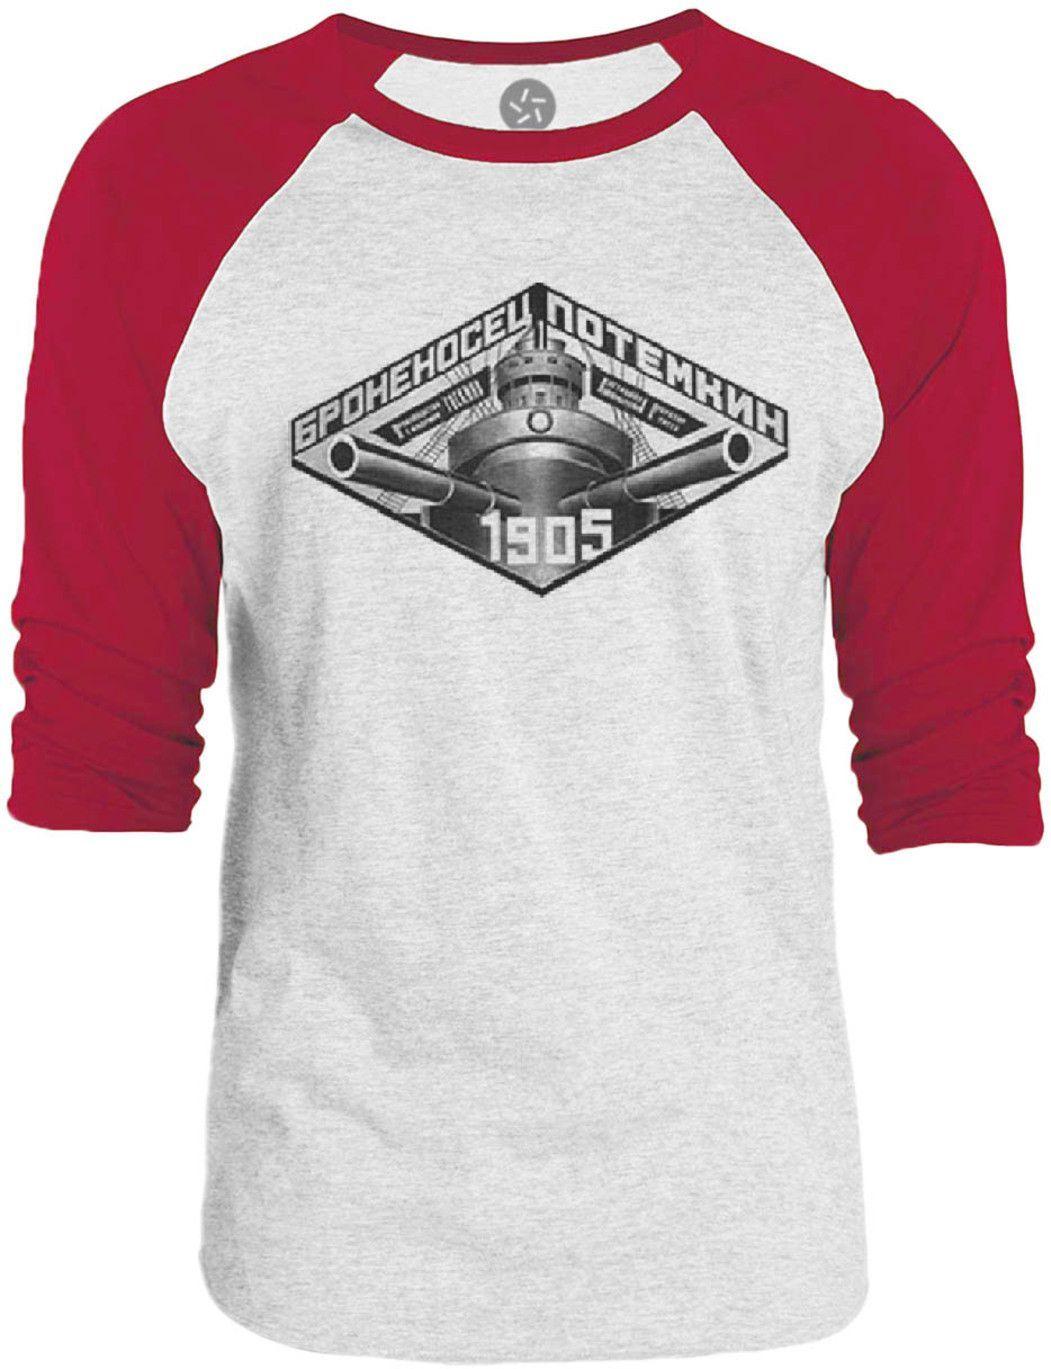 Big Texas Russian 1905 Vintage Poster (Black) 3/4-Sleeve Raglan Baseball T-Shirt